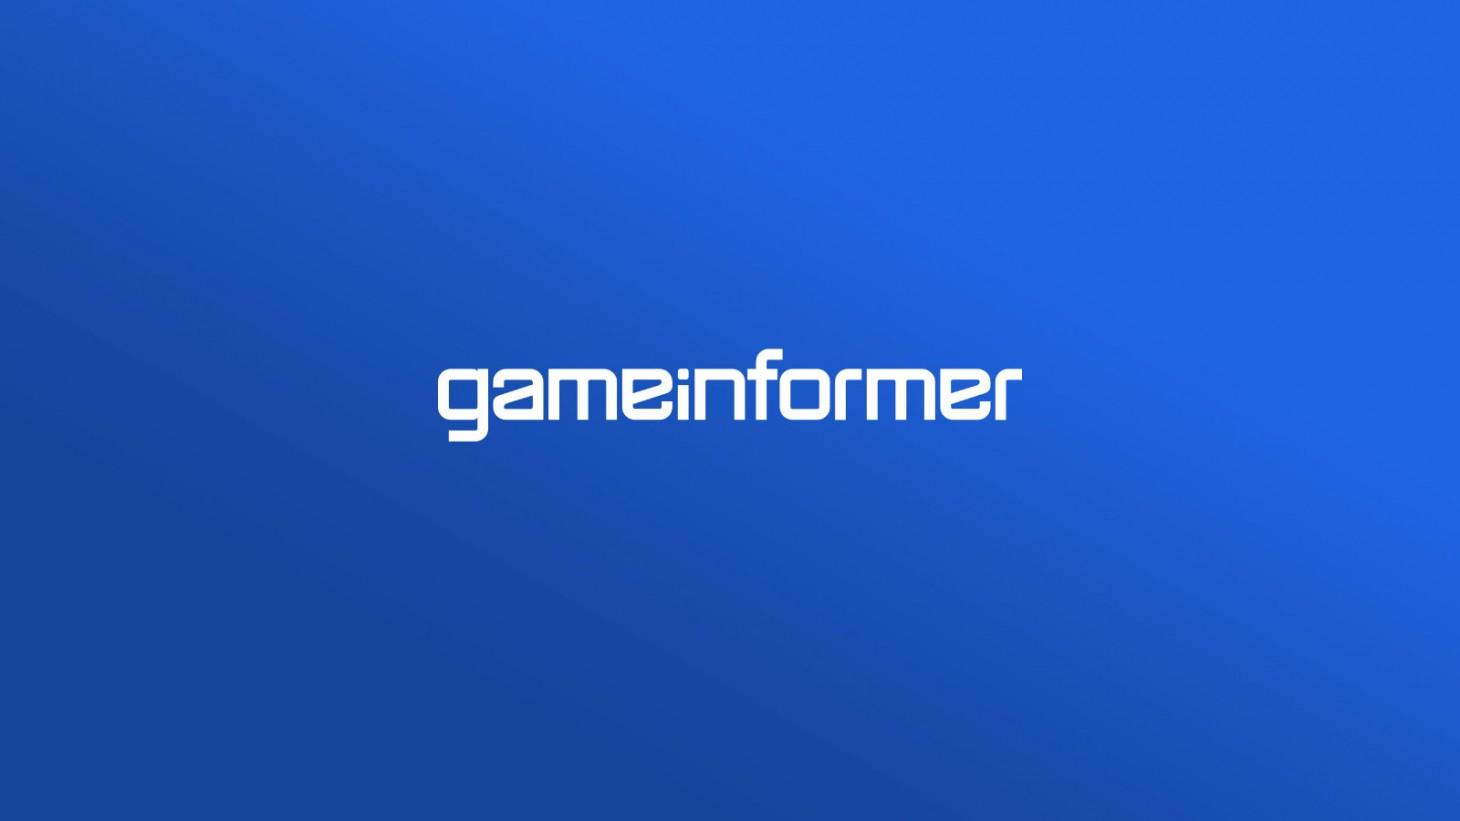 New Game Informer logo treatment